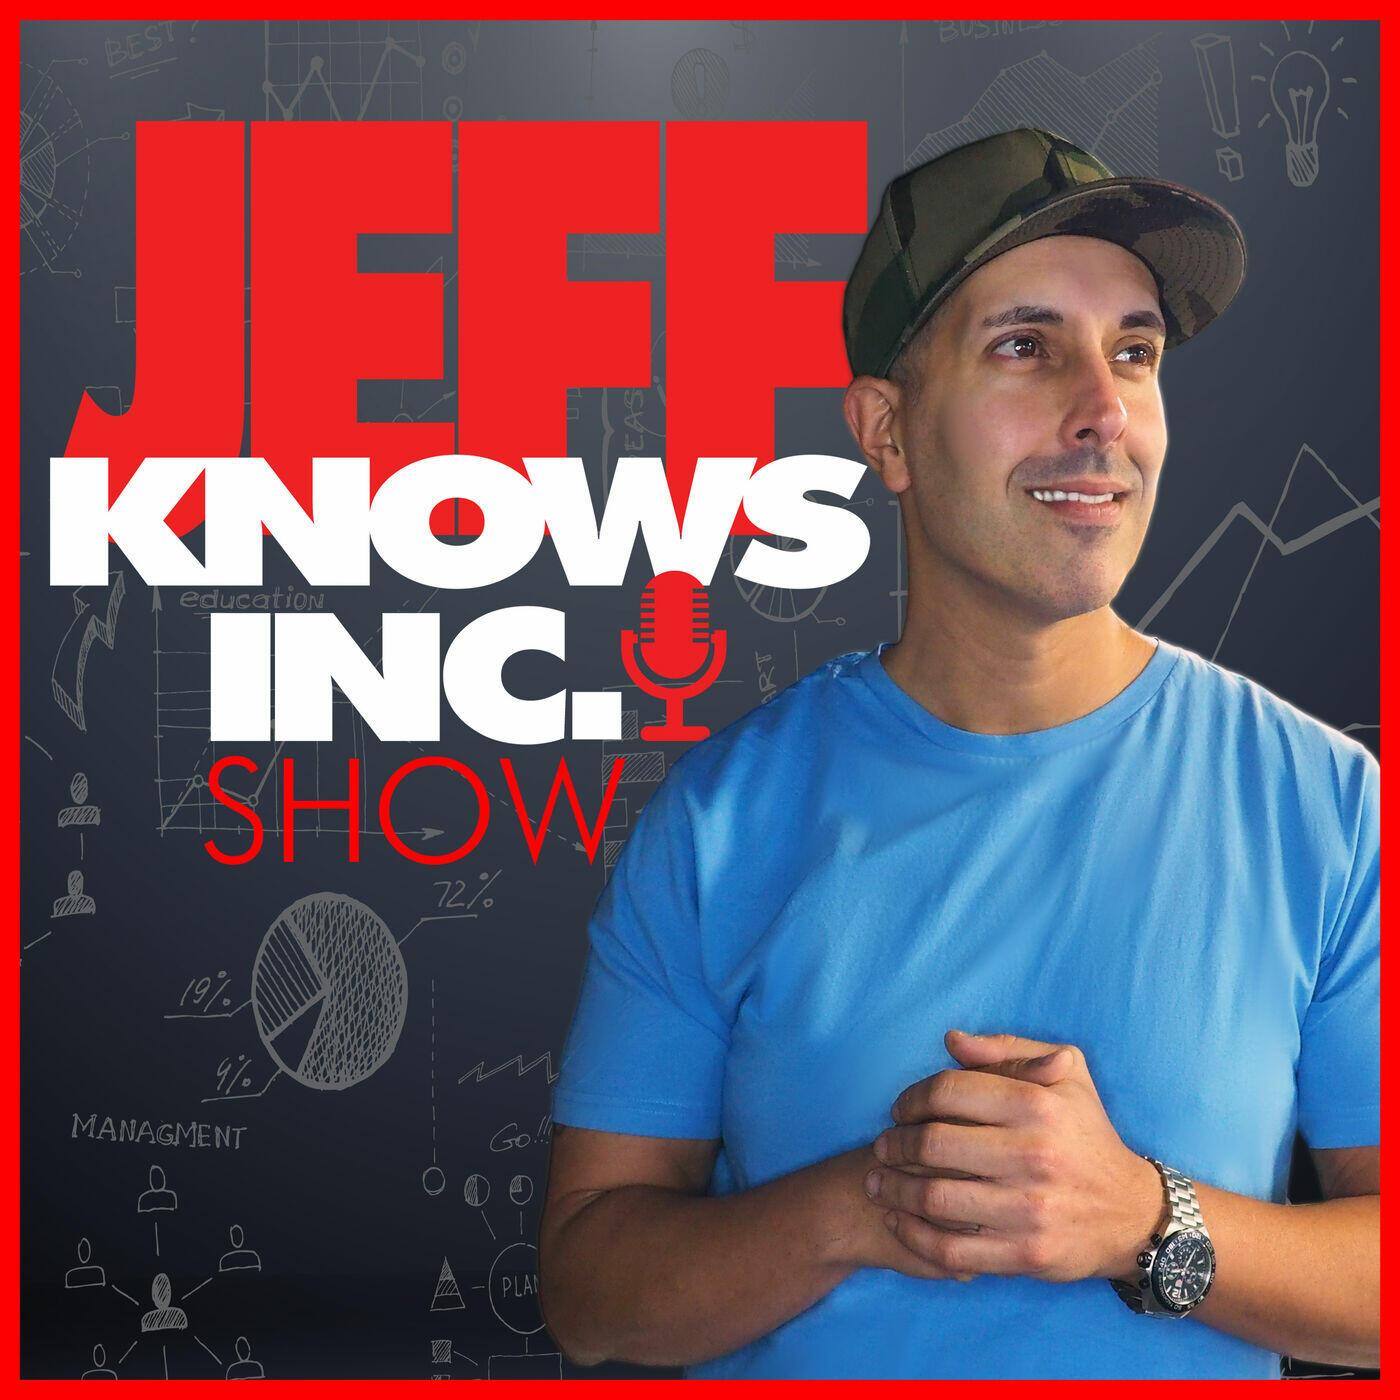 Jeff Knows Inc.